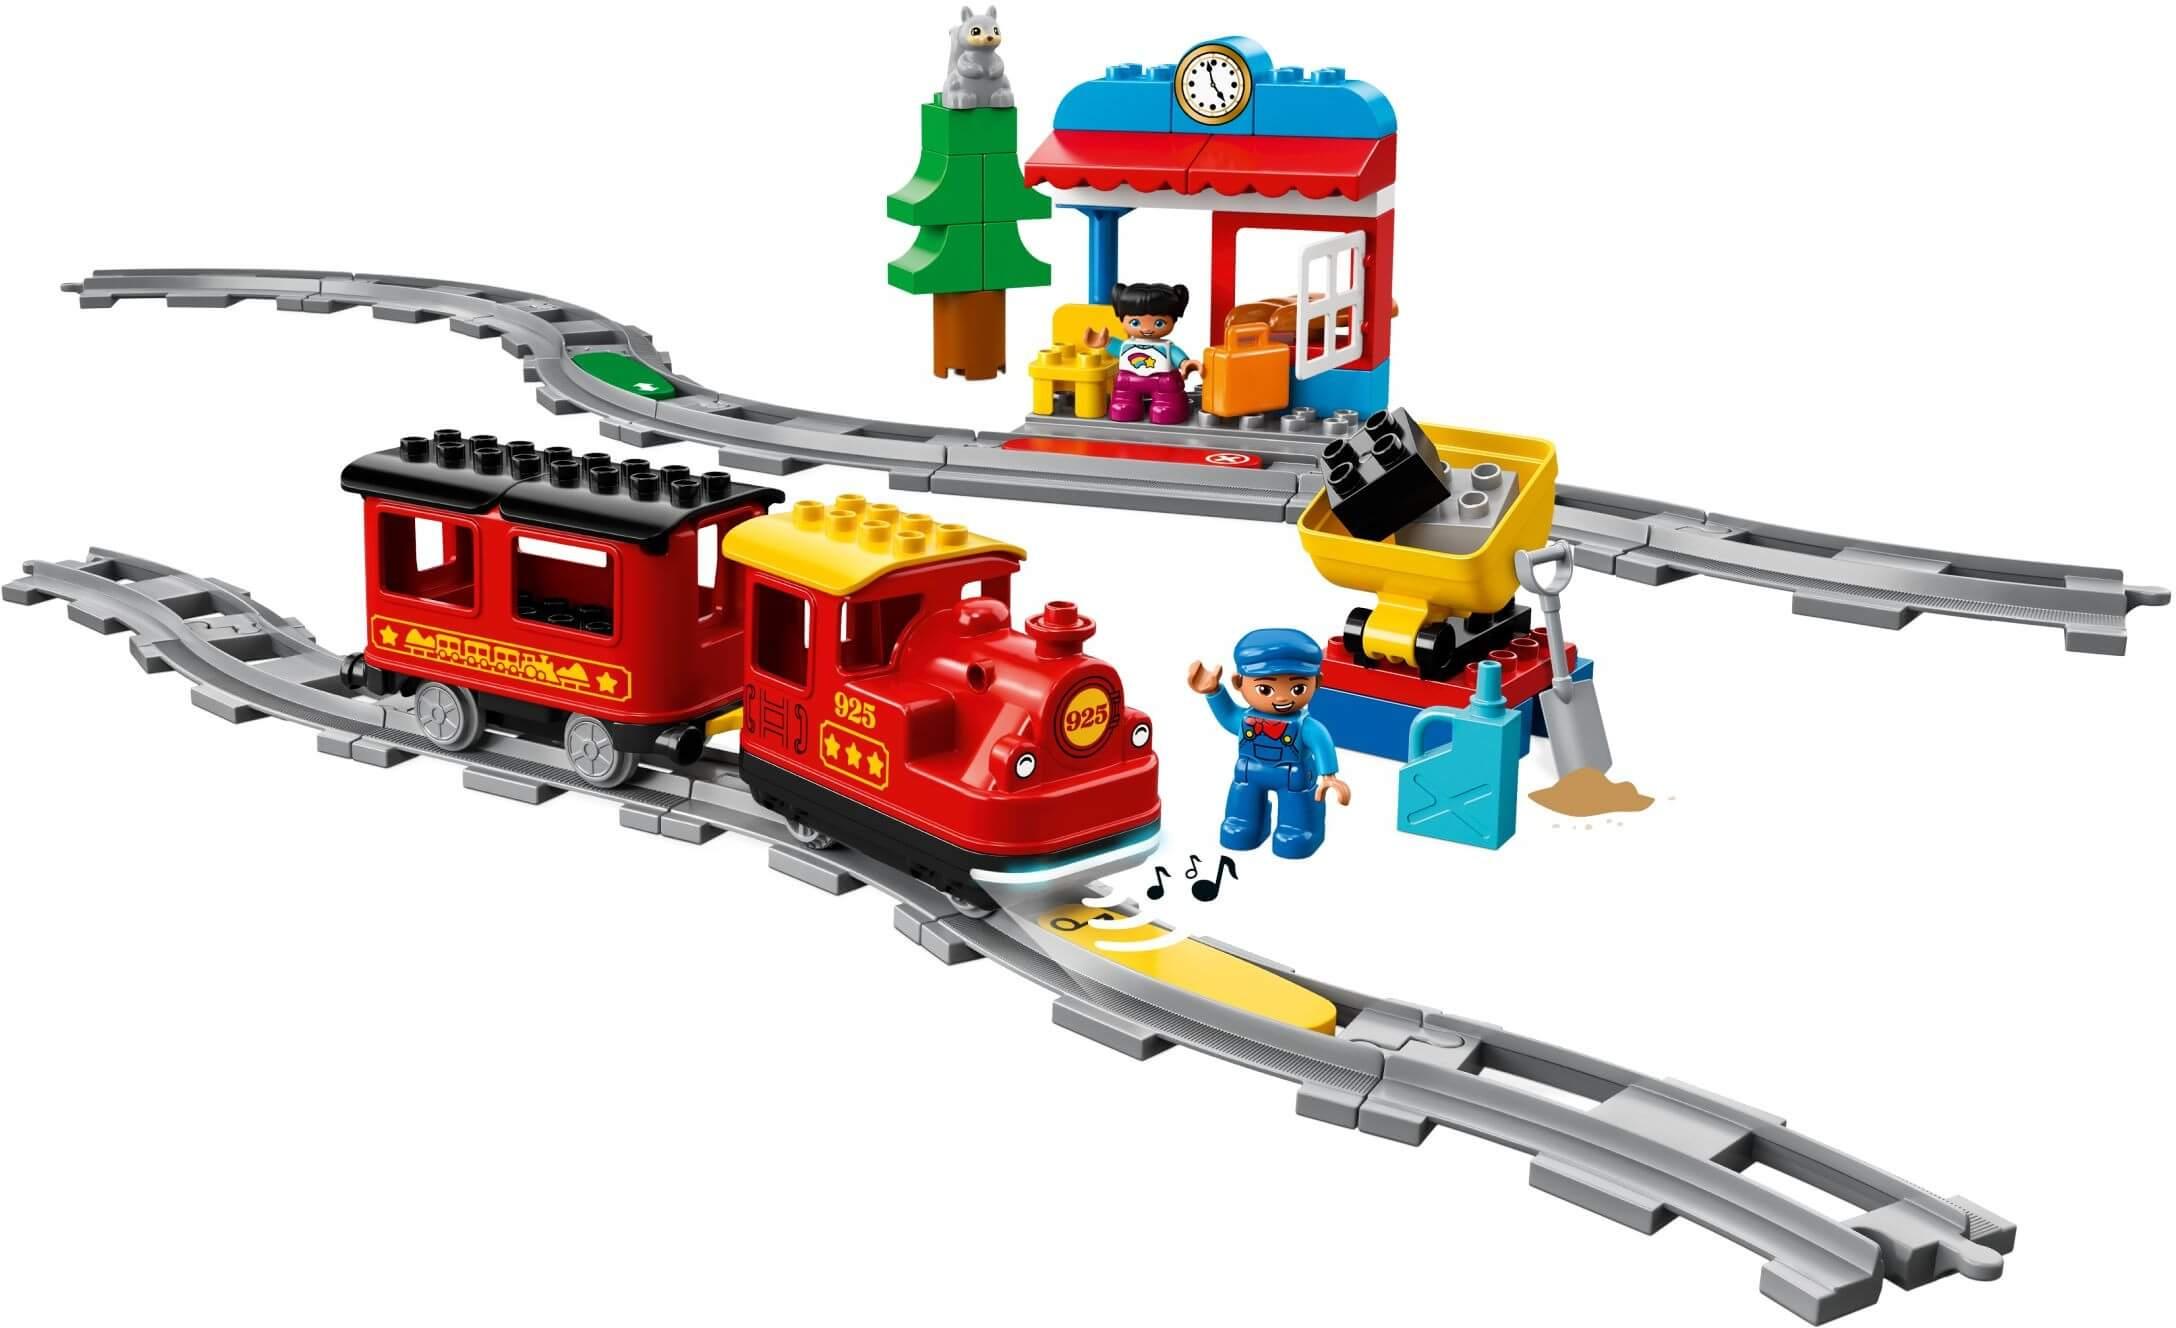 Mua đồ chơi LEGO 10874 - LEGO Duplo 10874 - Xe Lửa Hơi Nước (LEGO 10874 Steam Train)